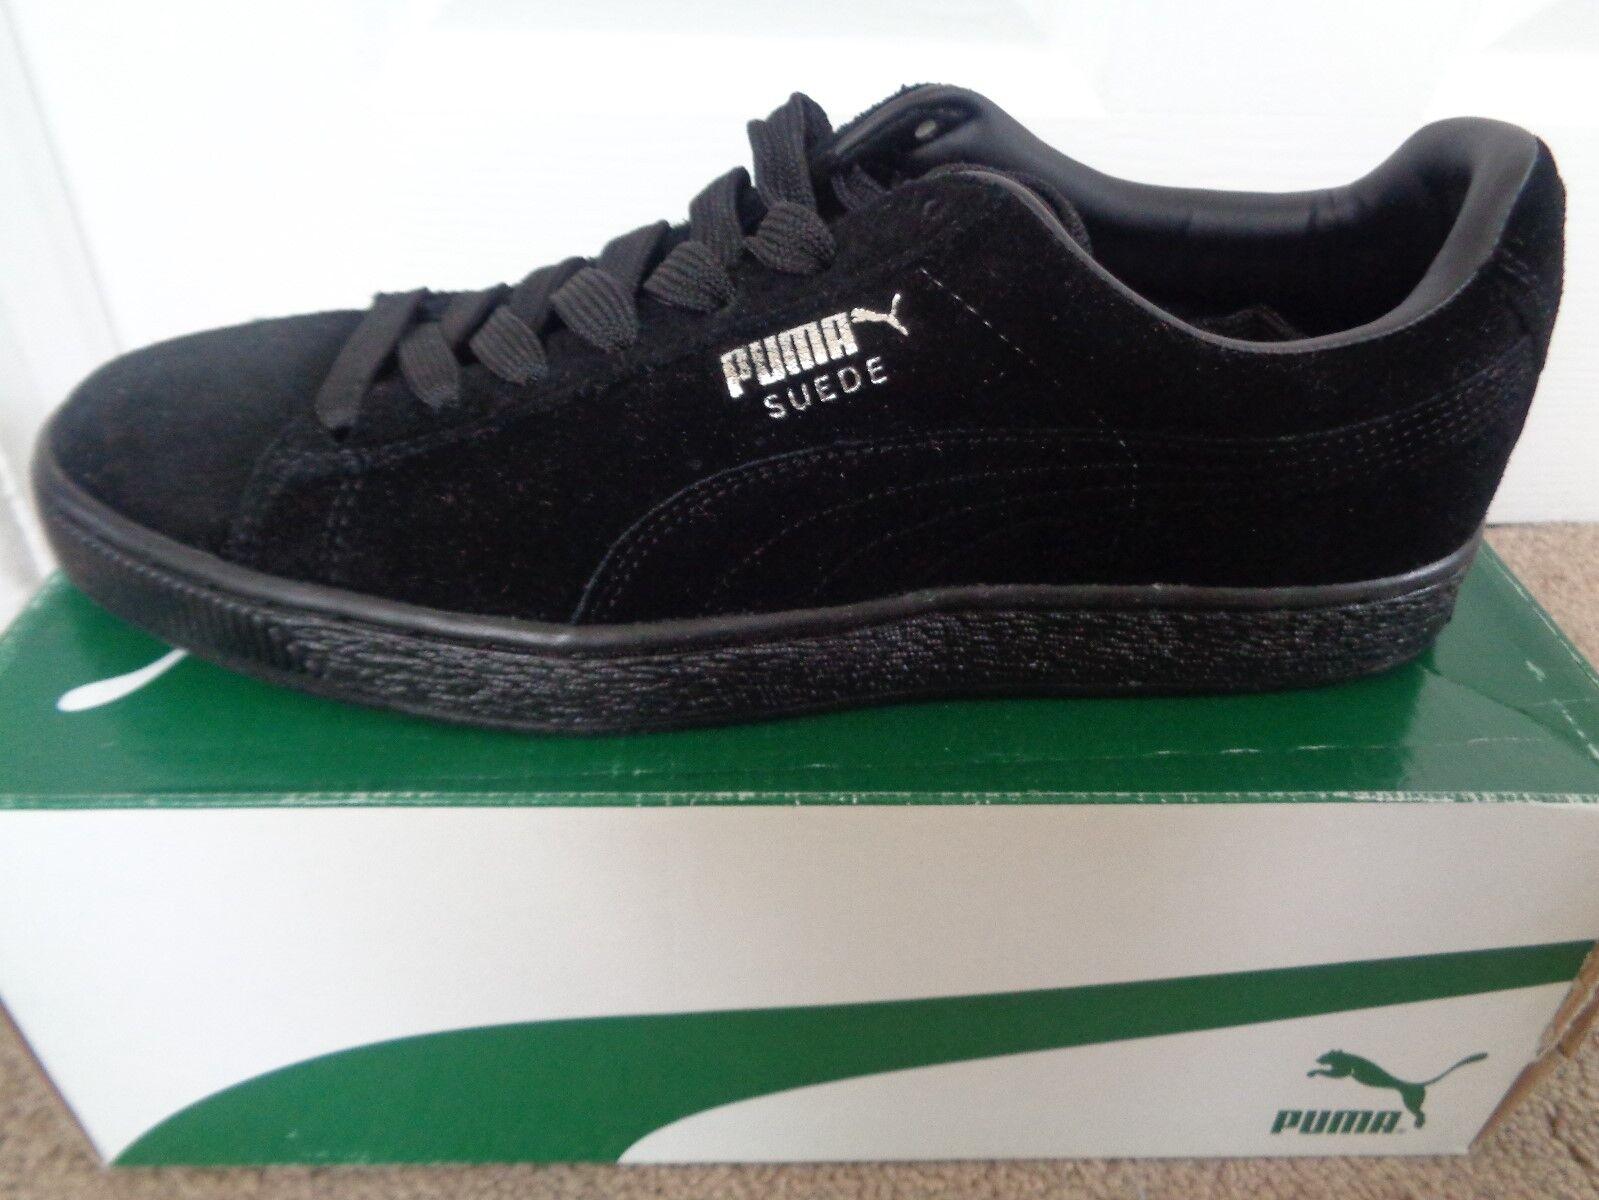 Puma Suede classic unisex trainers 6.5 sneaker 352634 77 uk 6.5 trainers eu 40 us 7.5 NEW+BOX 693860